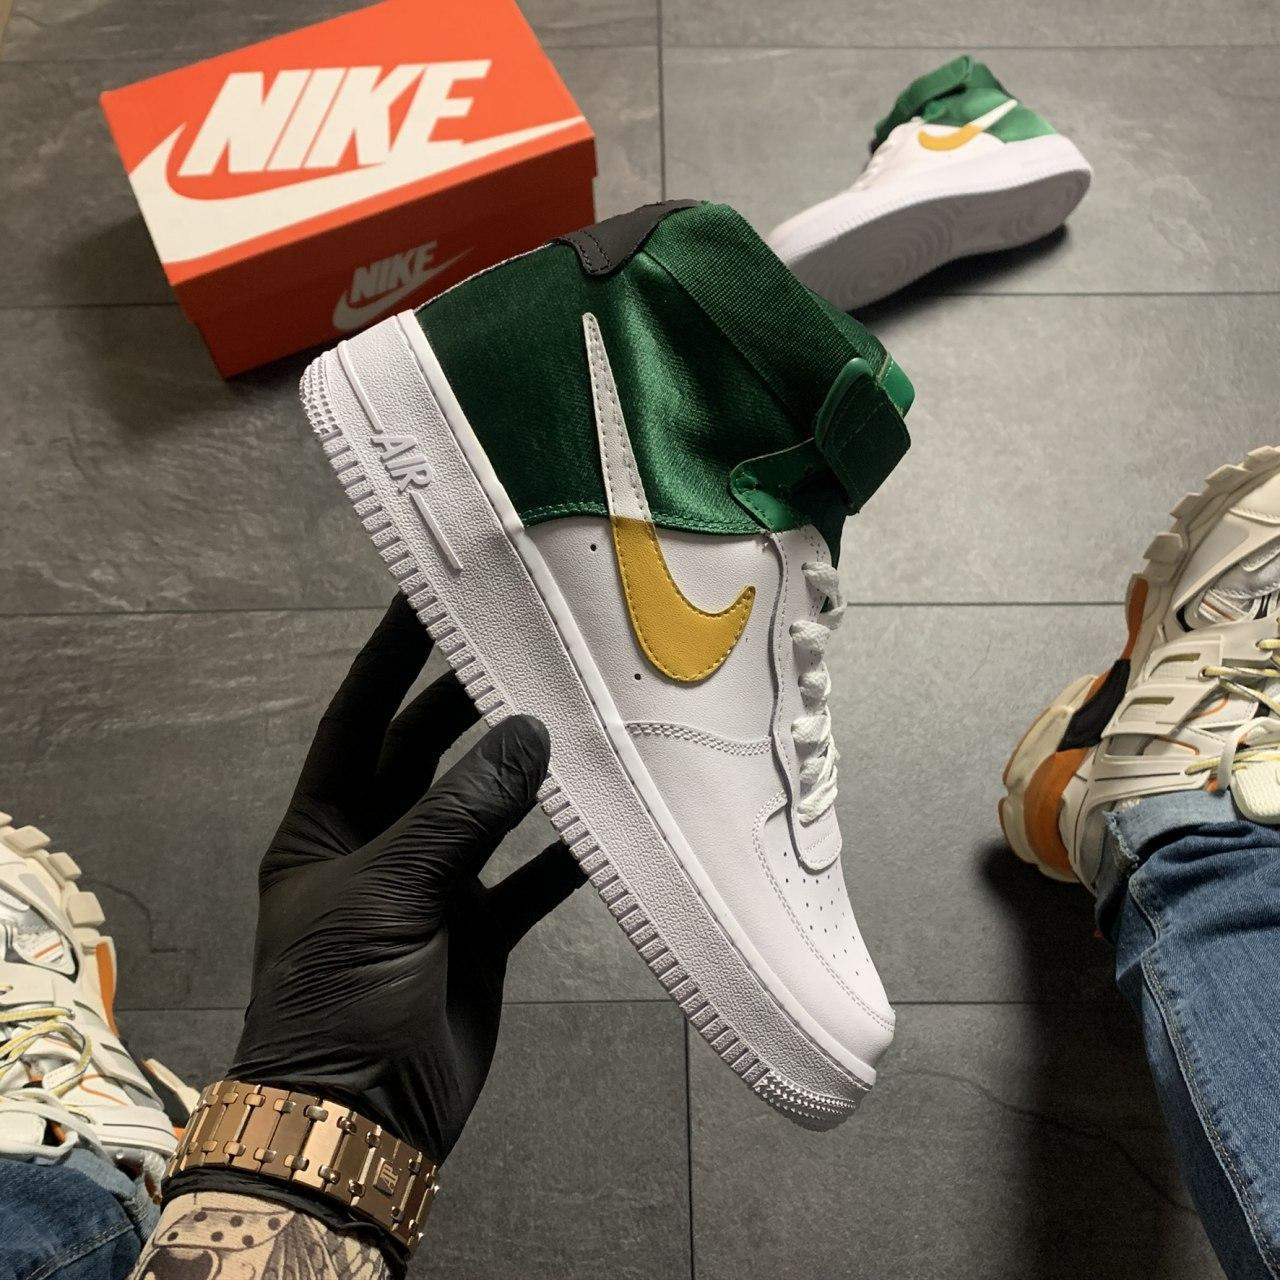 🔥 ВИДЕО ОБЗОР 🔥 Nike Air Force 1 High Green White Белый Найк Аир Форс 1 🔥 Найк мужские кроссовки 🔥